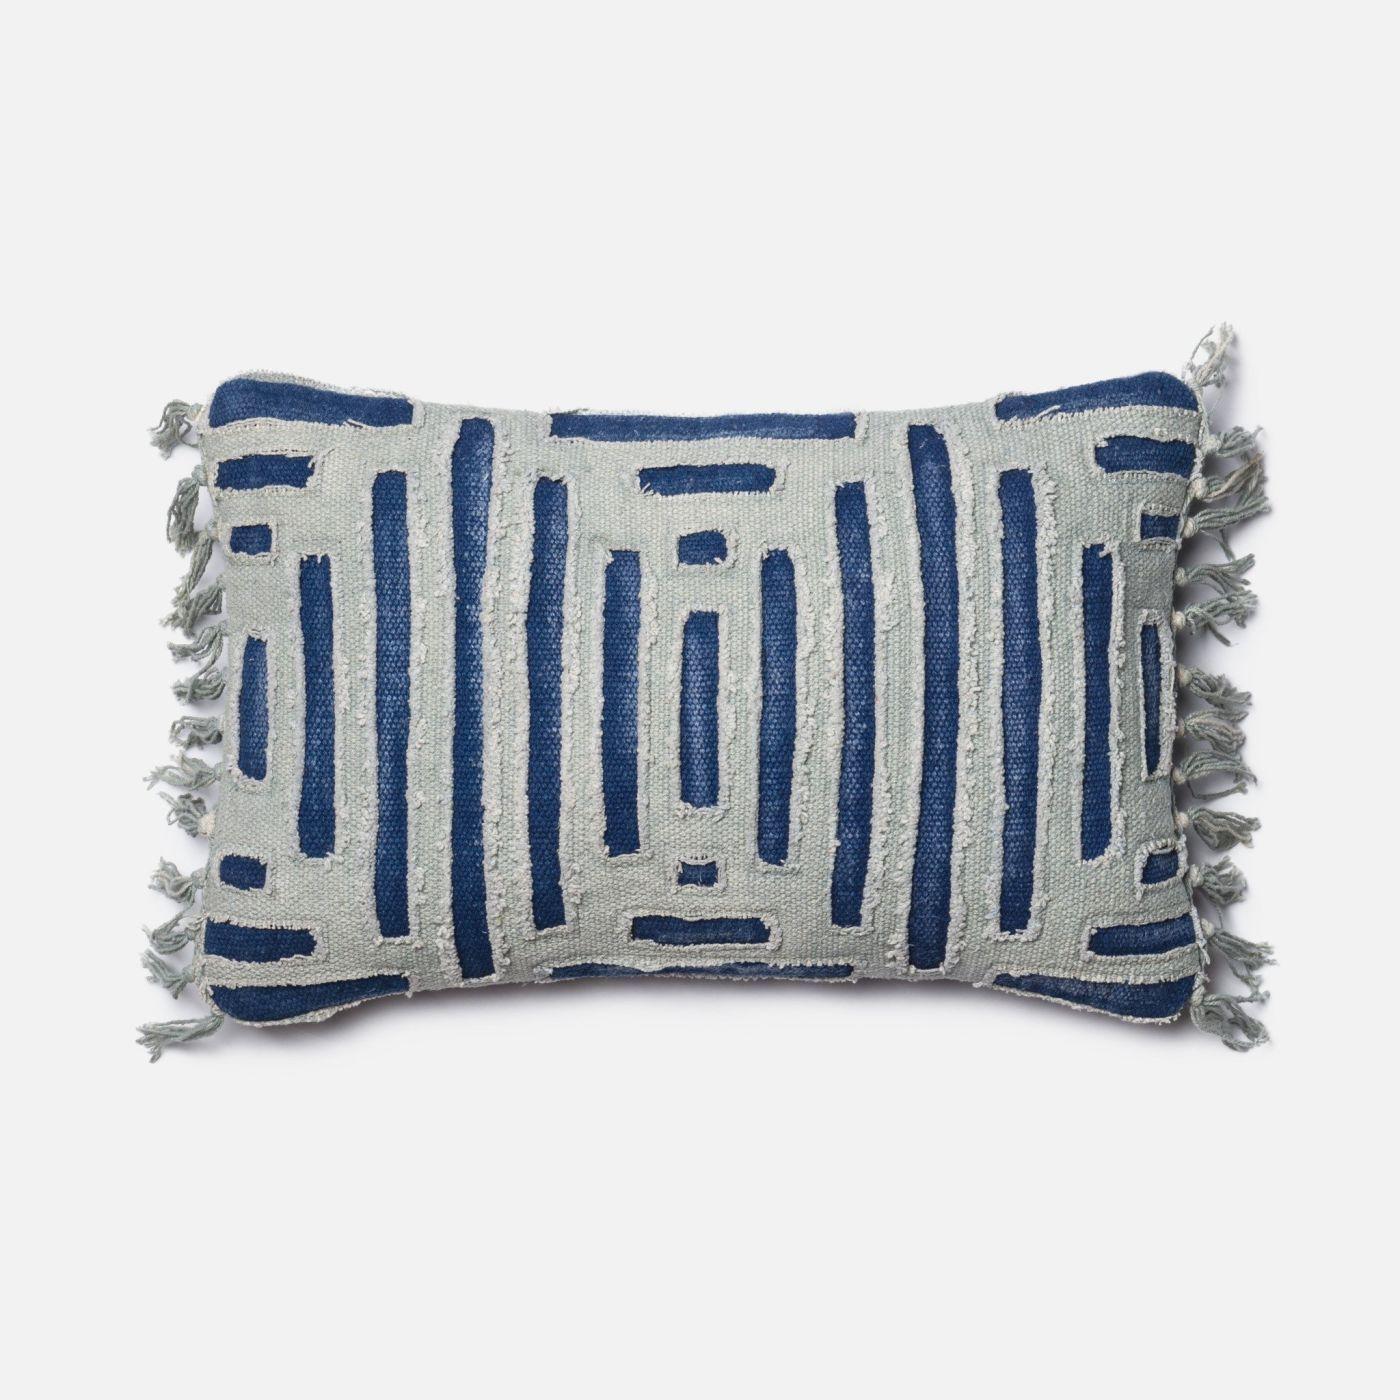 Loloi blue grey decorative throw pillow p blue grey